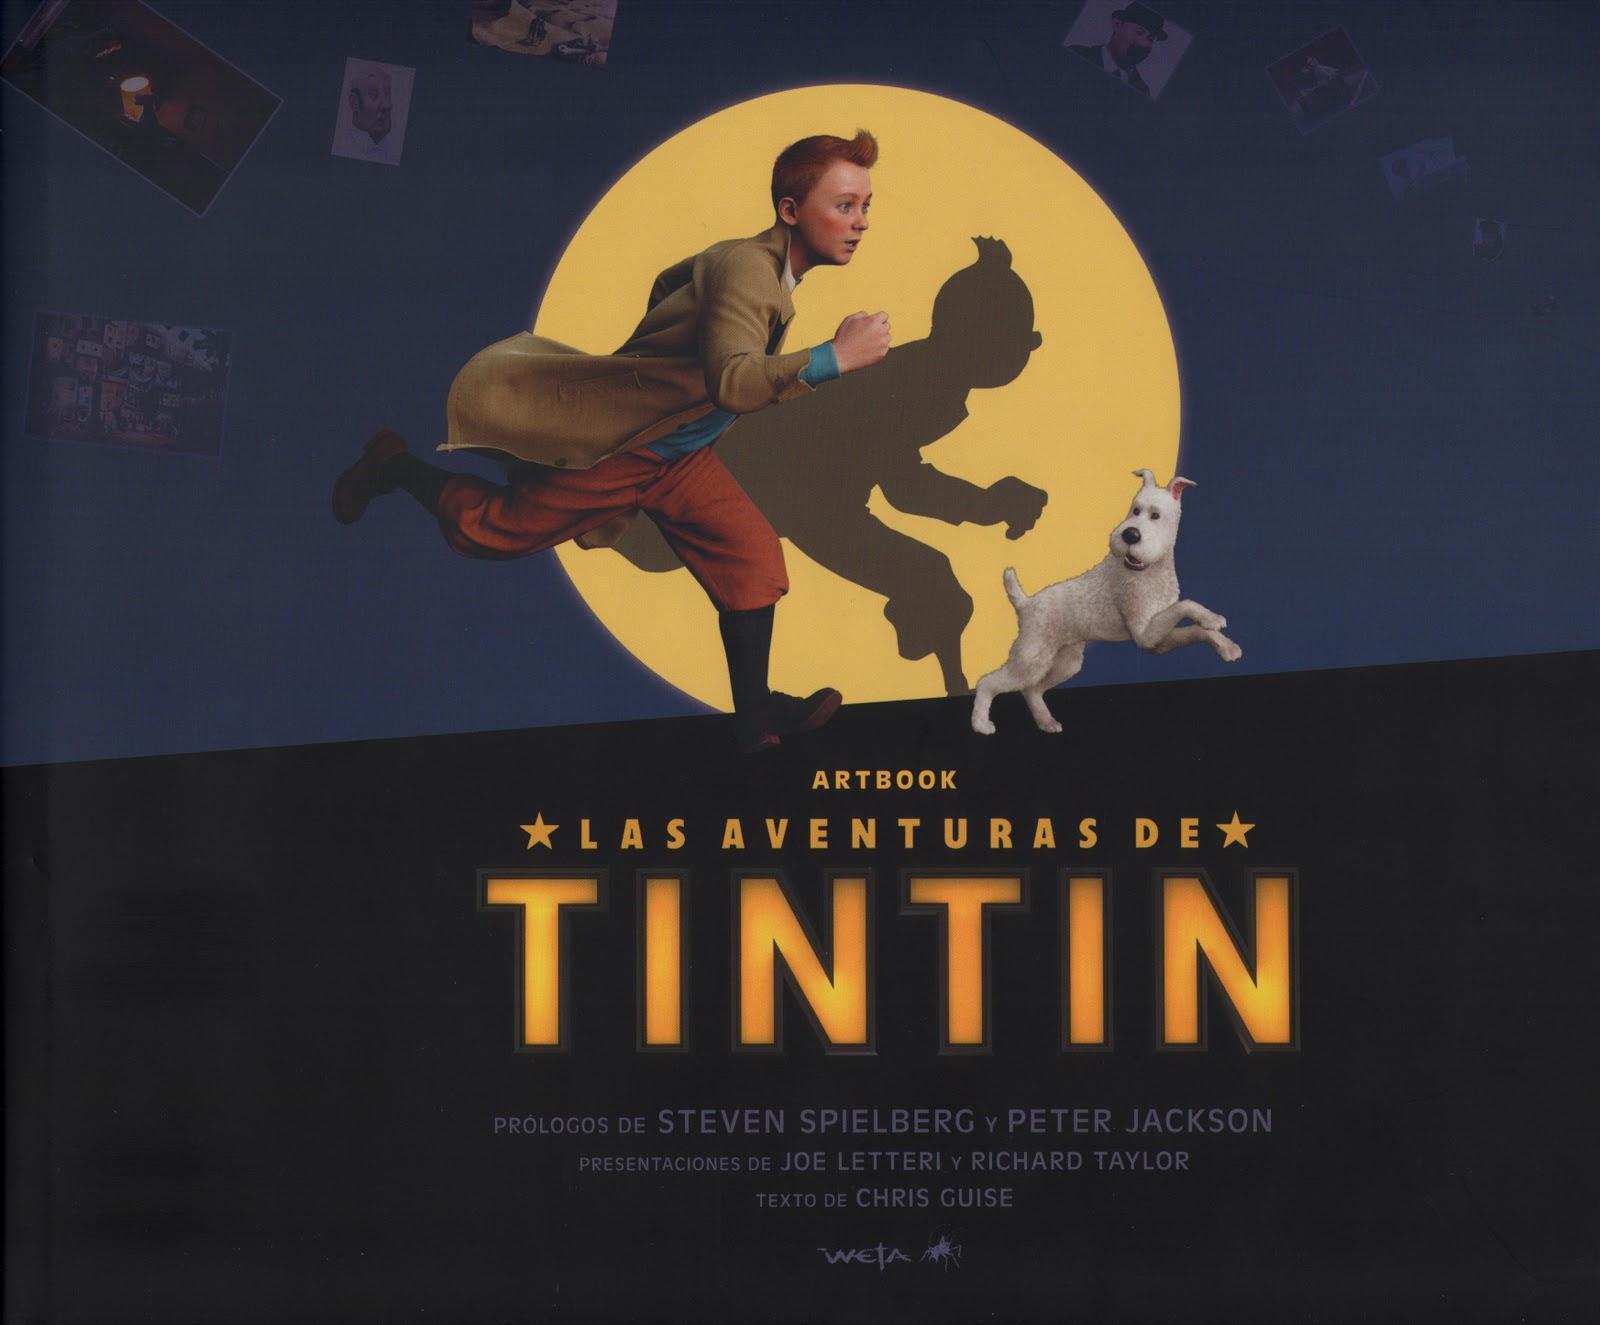 Artbook. Las aventuras de Tintín